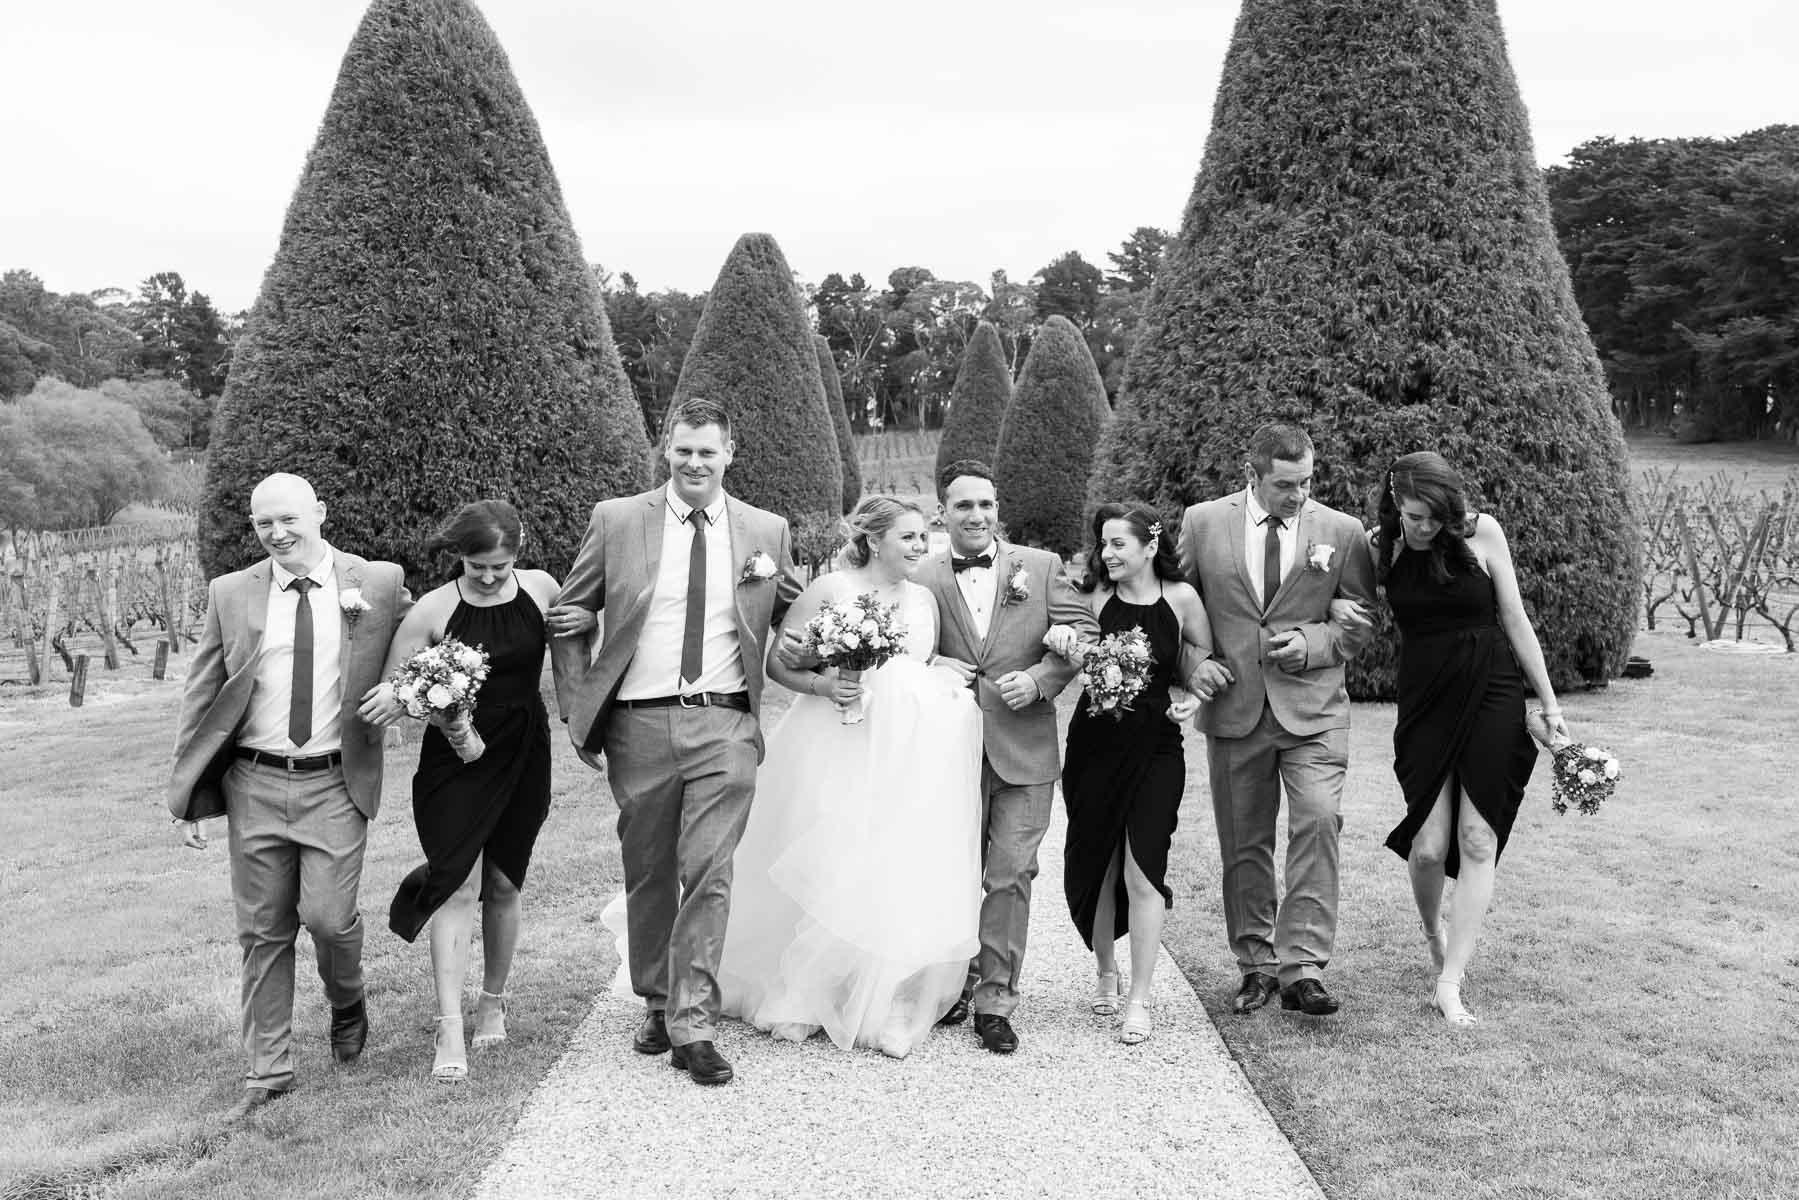 lindenderry-wedding-heart+soul-weddings-amy-alain-03560.jpg